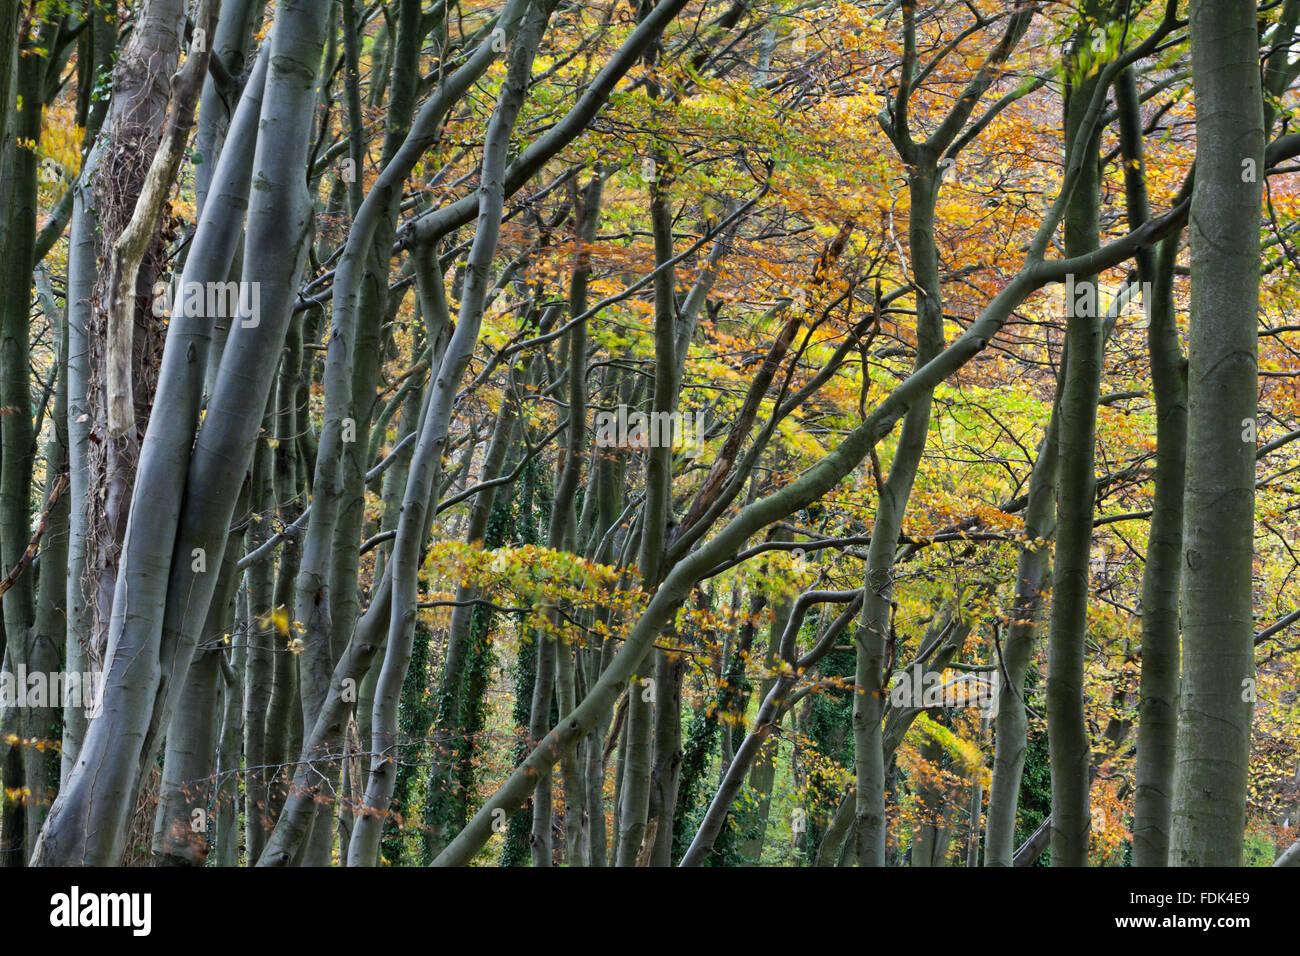 a63ea02bc6fb3e Woodland in November at Moleskin and Markham Hills, Bedfordshire. - Stock  Image